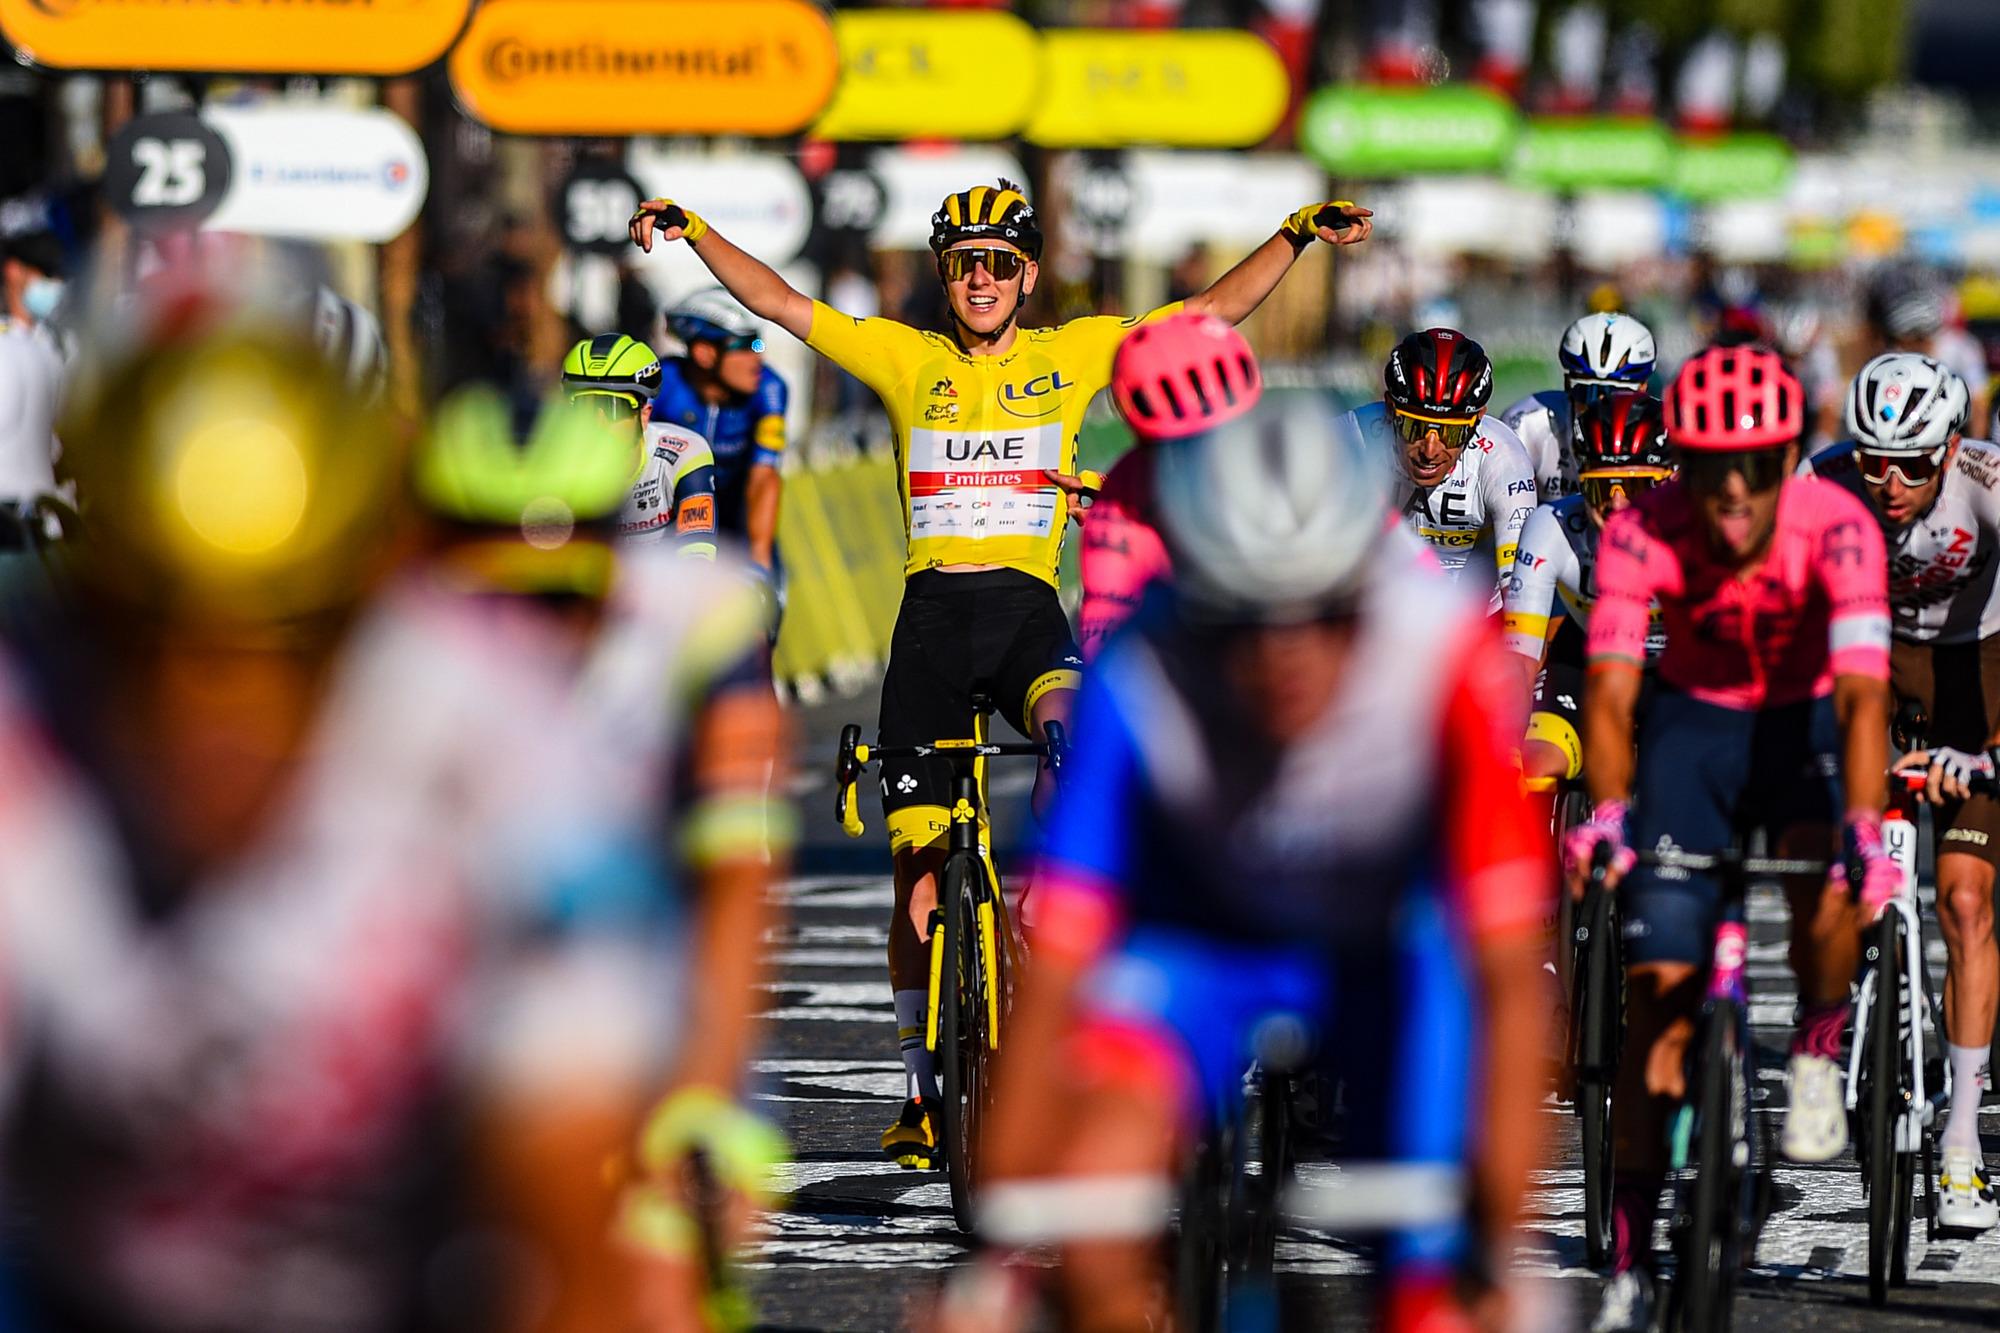 Tour de France 2021 108th Edition 21th stage Chatou Paris Champs Elysees 1084 km 18072021 Tadej Pogacar SLO UAE Team Emirates photo Dario BelingheriBettiniPhoto2021